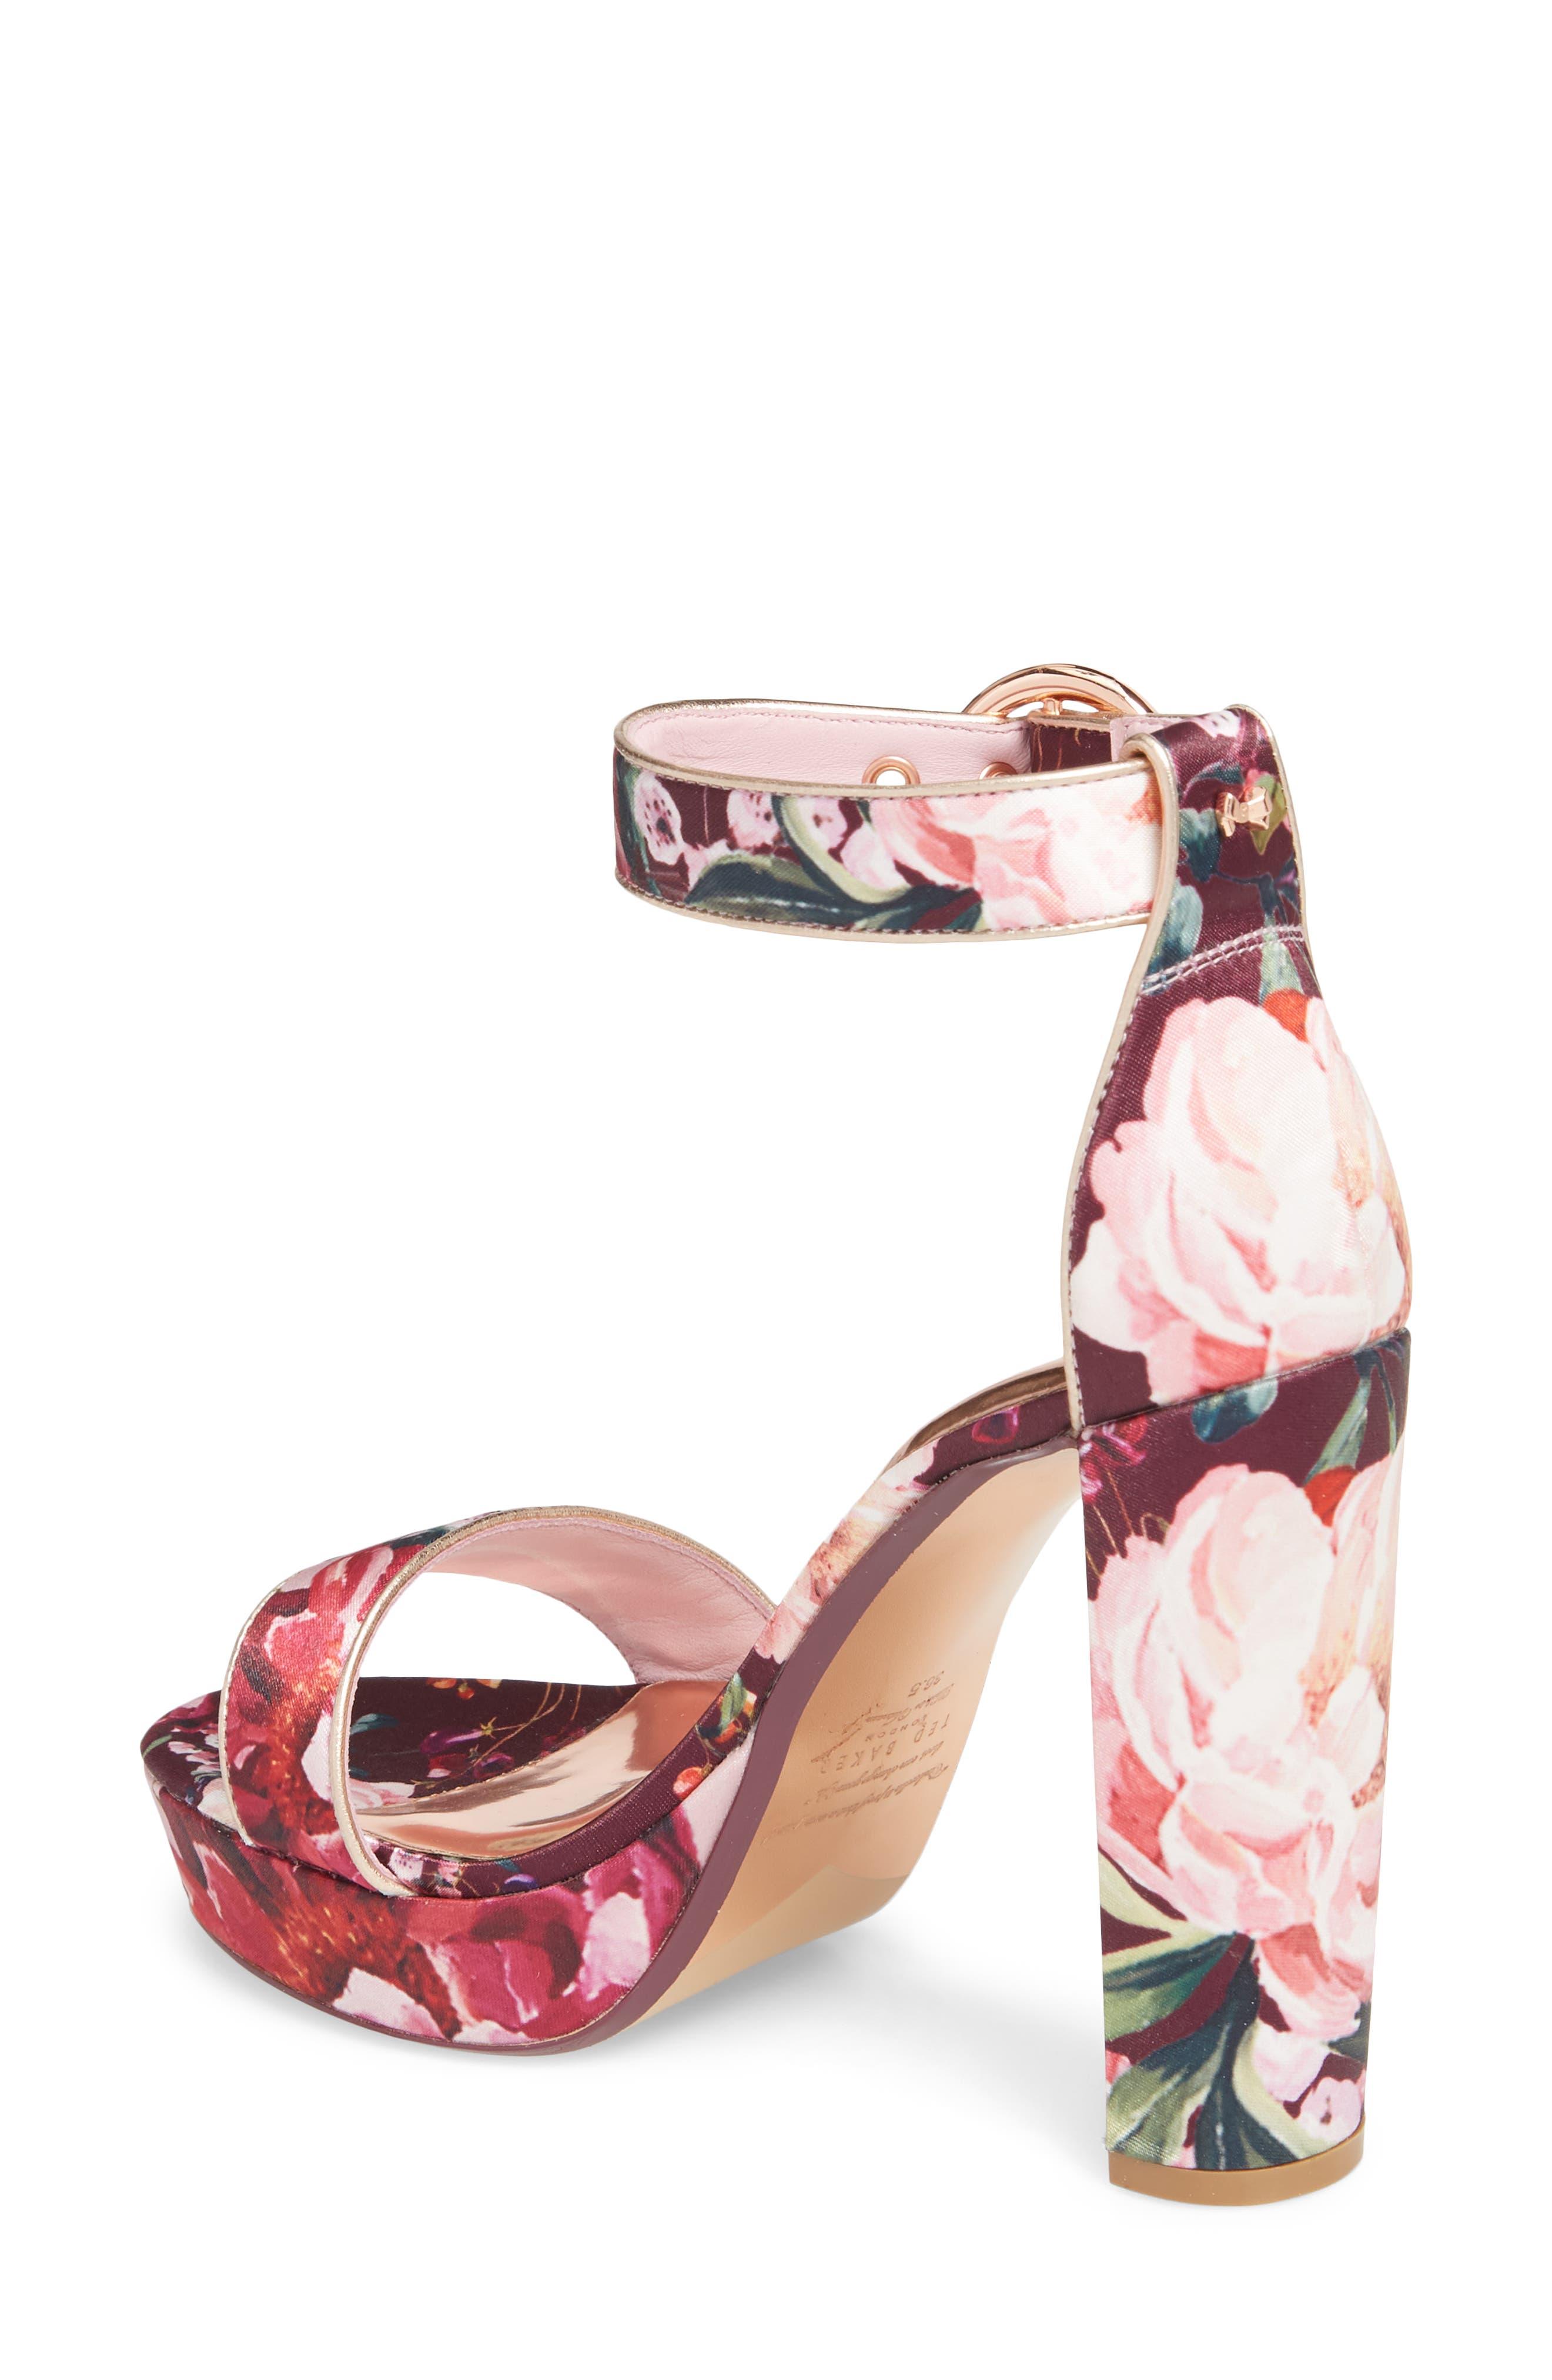 Jewll Ankle Strap Sandal,                             Alternate thumbnail 2, color,                             Serenity Satin